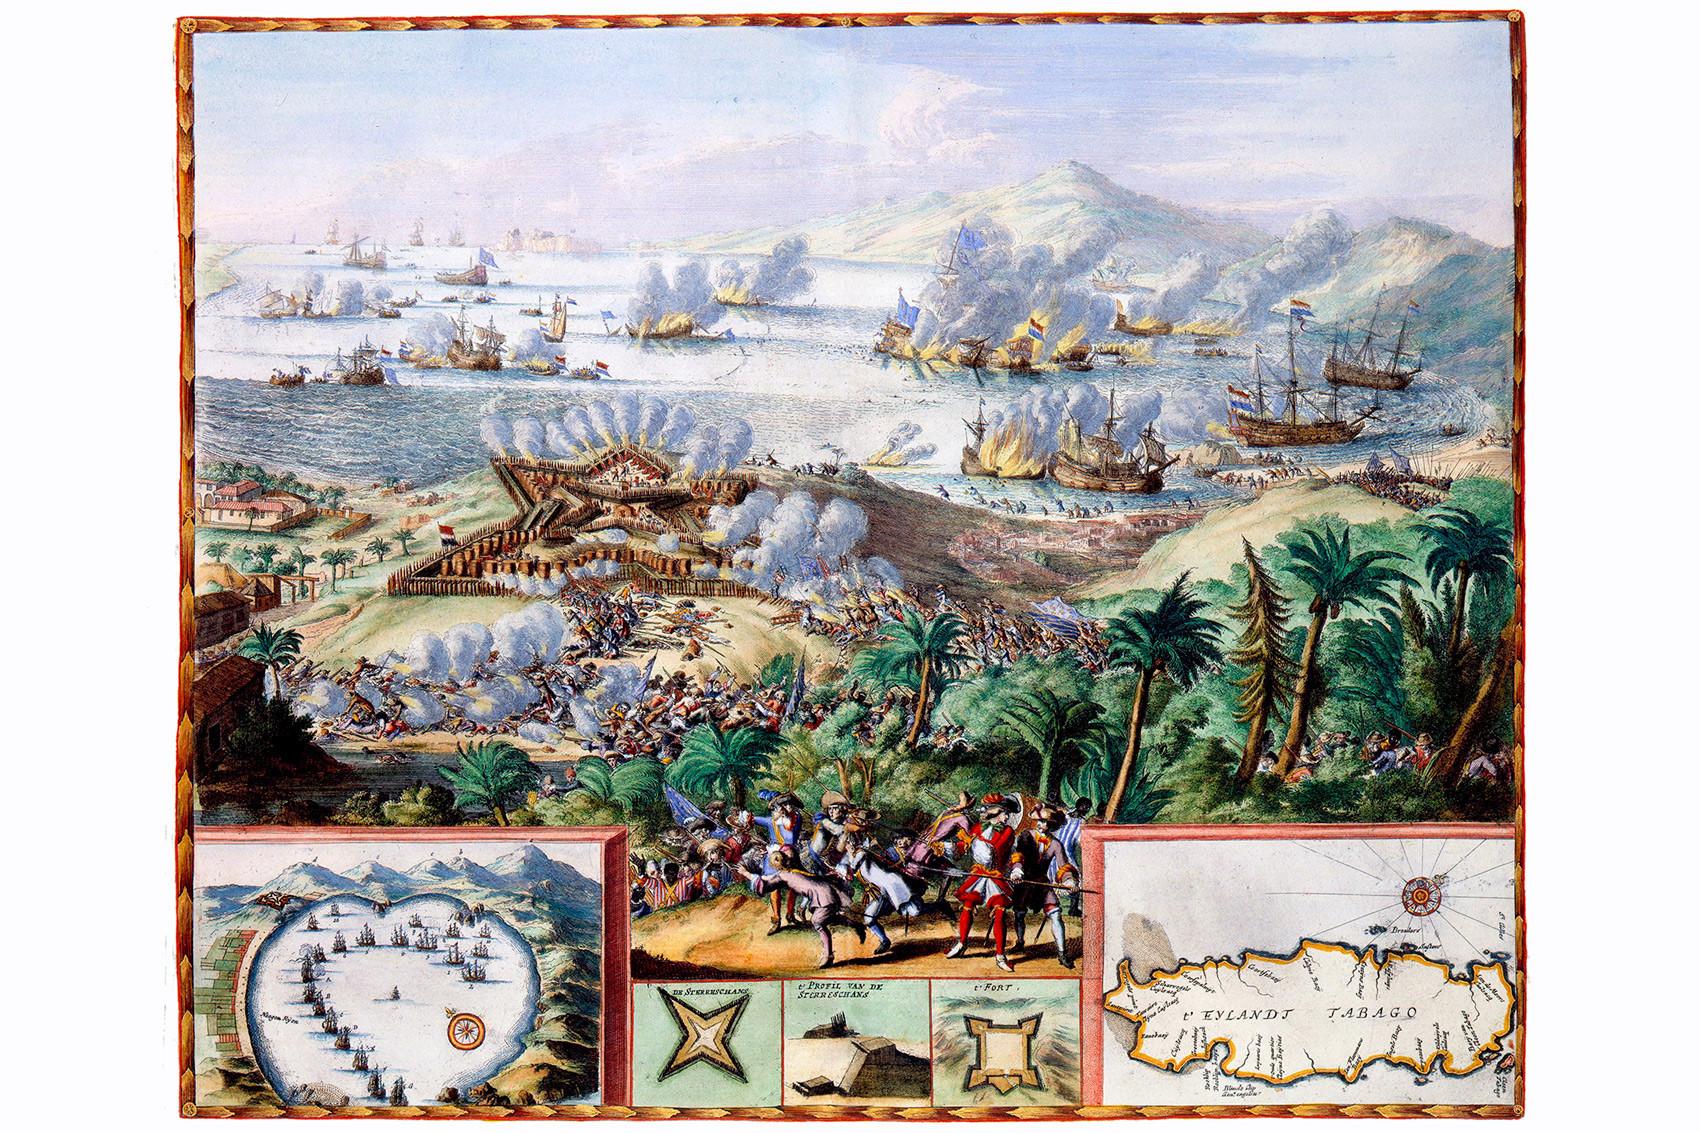 Tobago, por Von Romeyn de Hooghe, Amsterdã 1677.